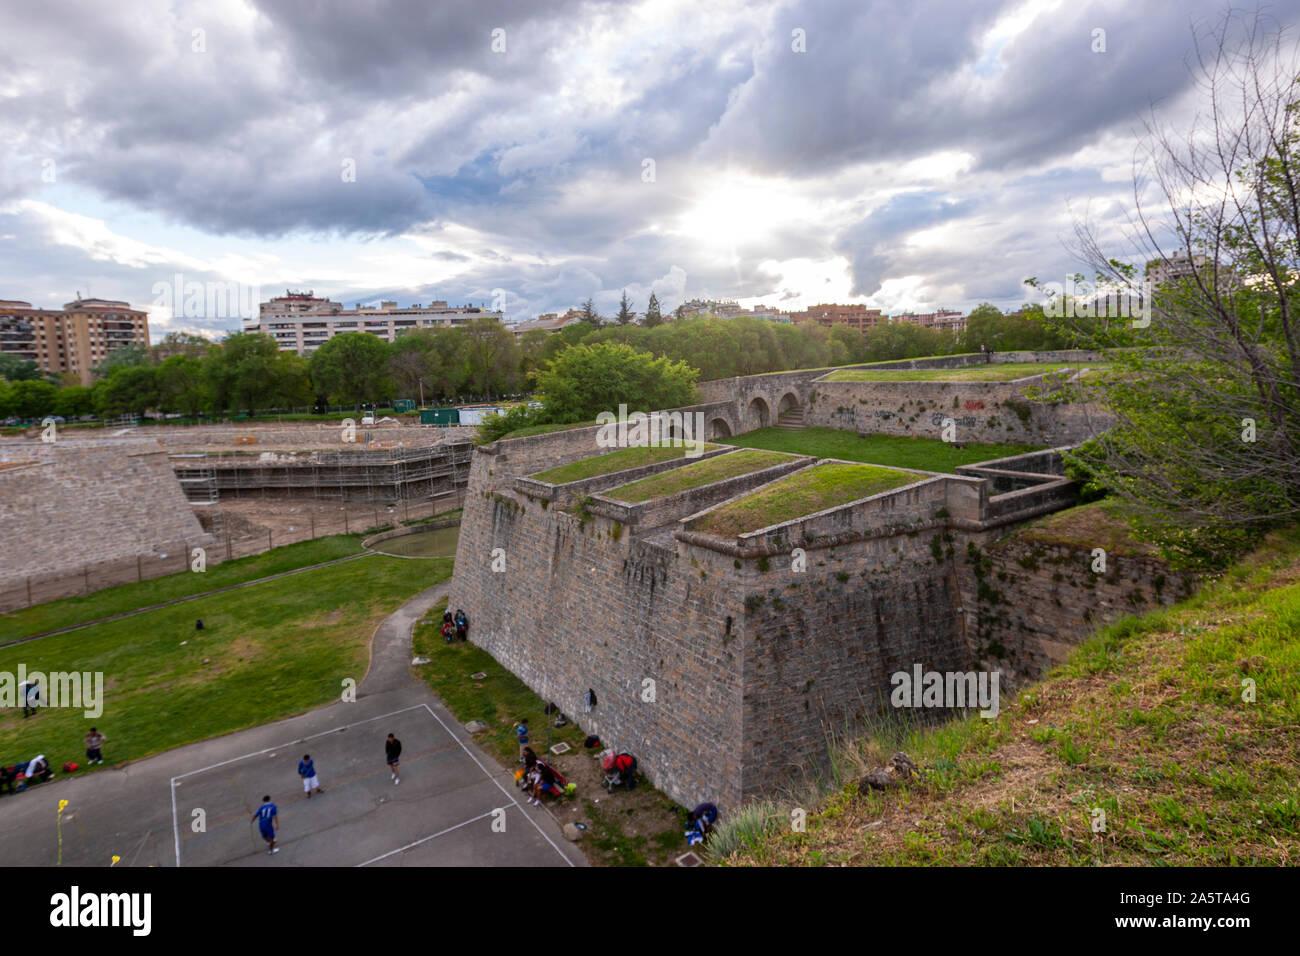 Pentagonal fortress Citadel of Pamplona, Navarra, Spain Stock Photo